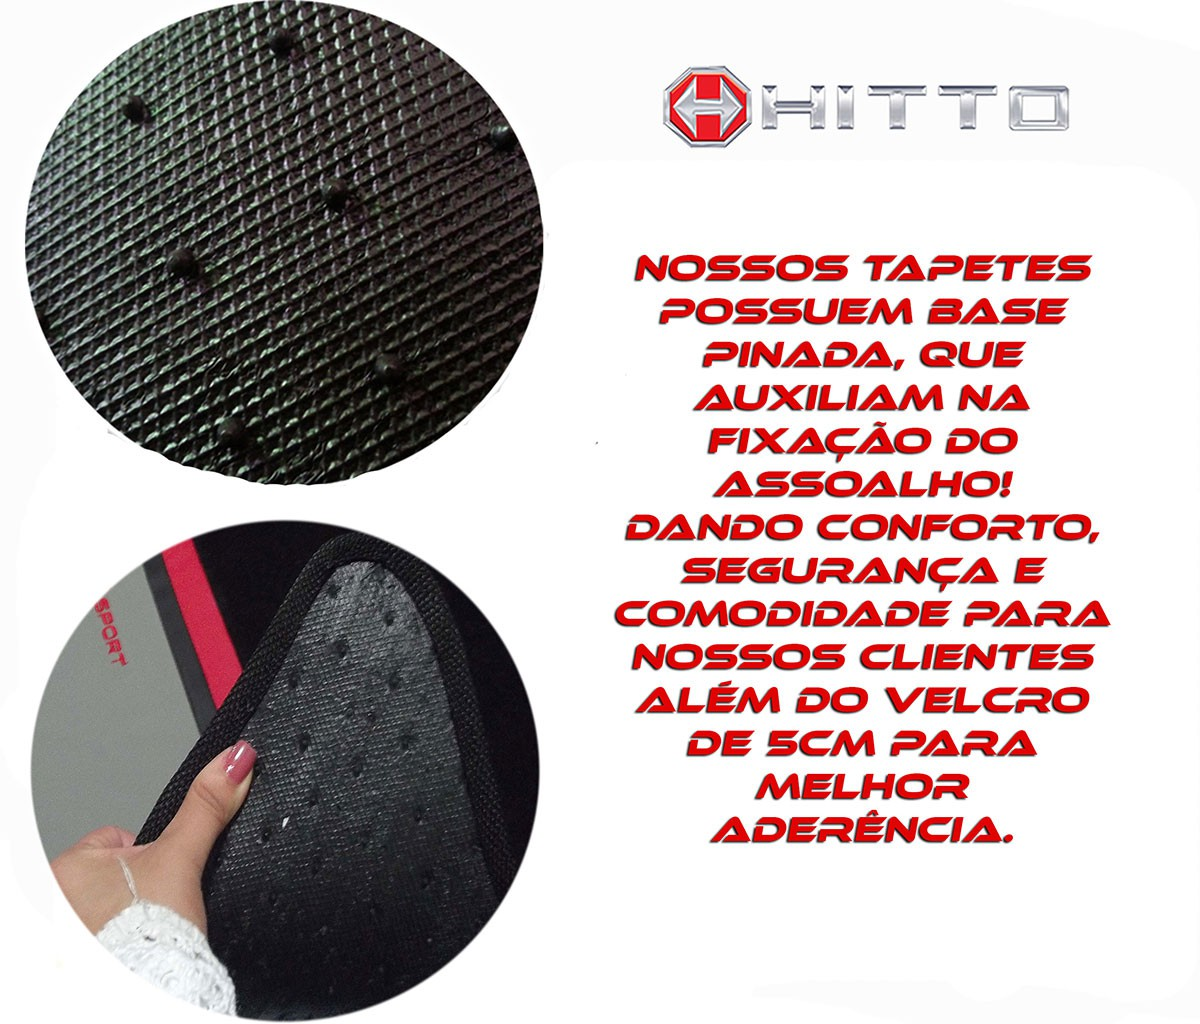 Tapete Hyundai I30 .../2013 Carpete Luxo Base Pinada Hitto